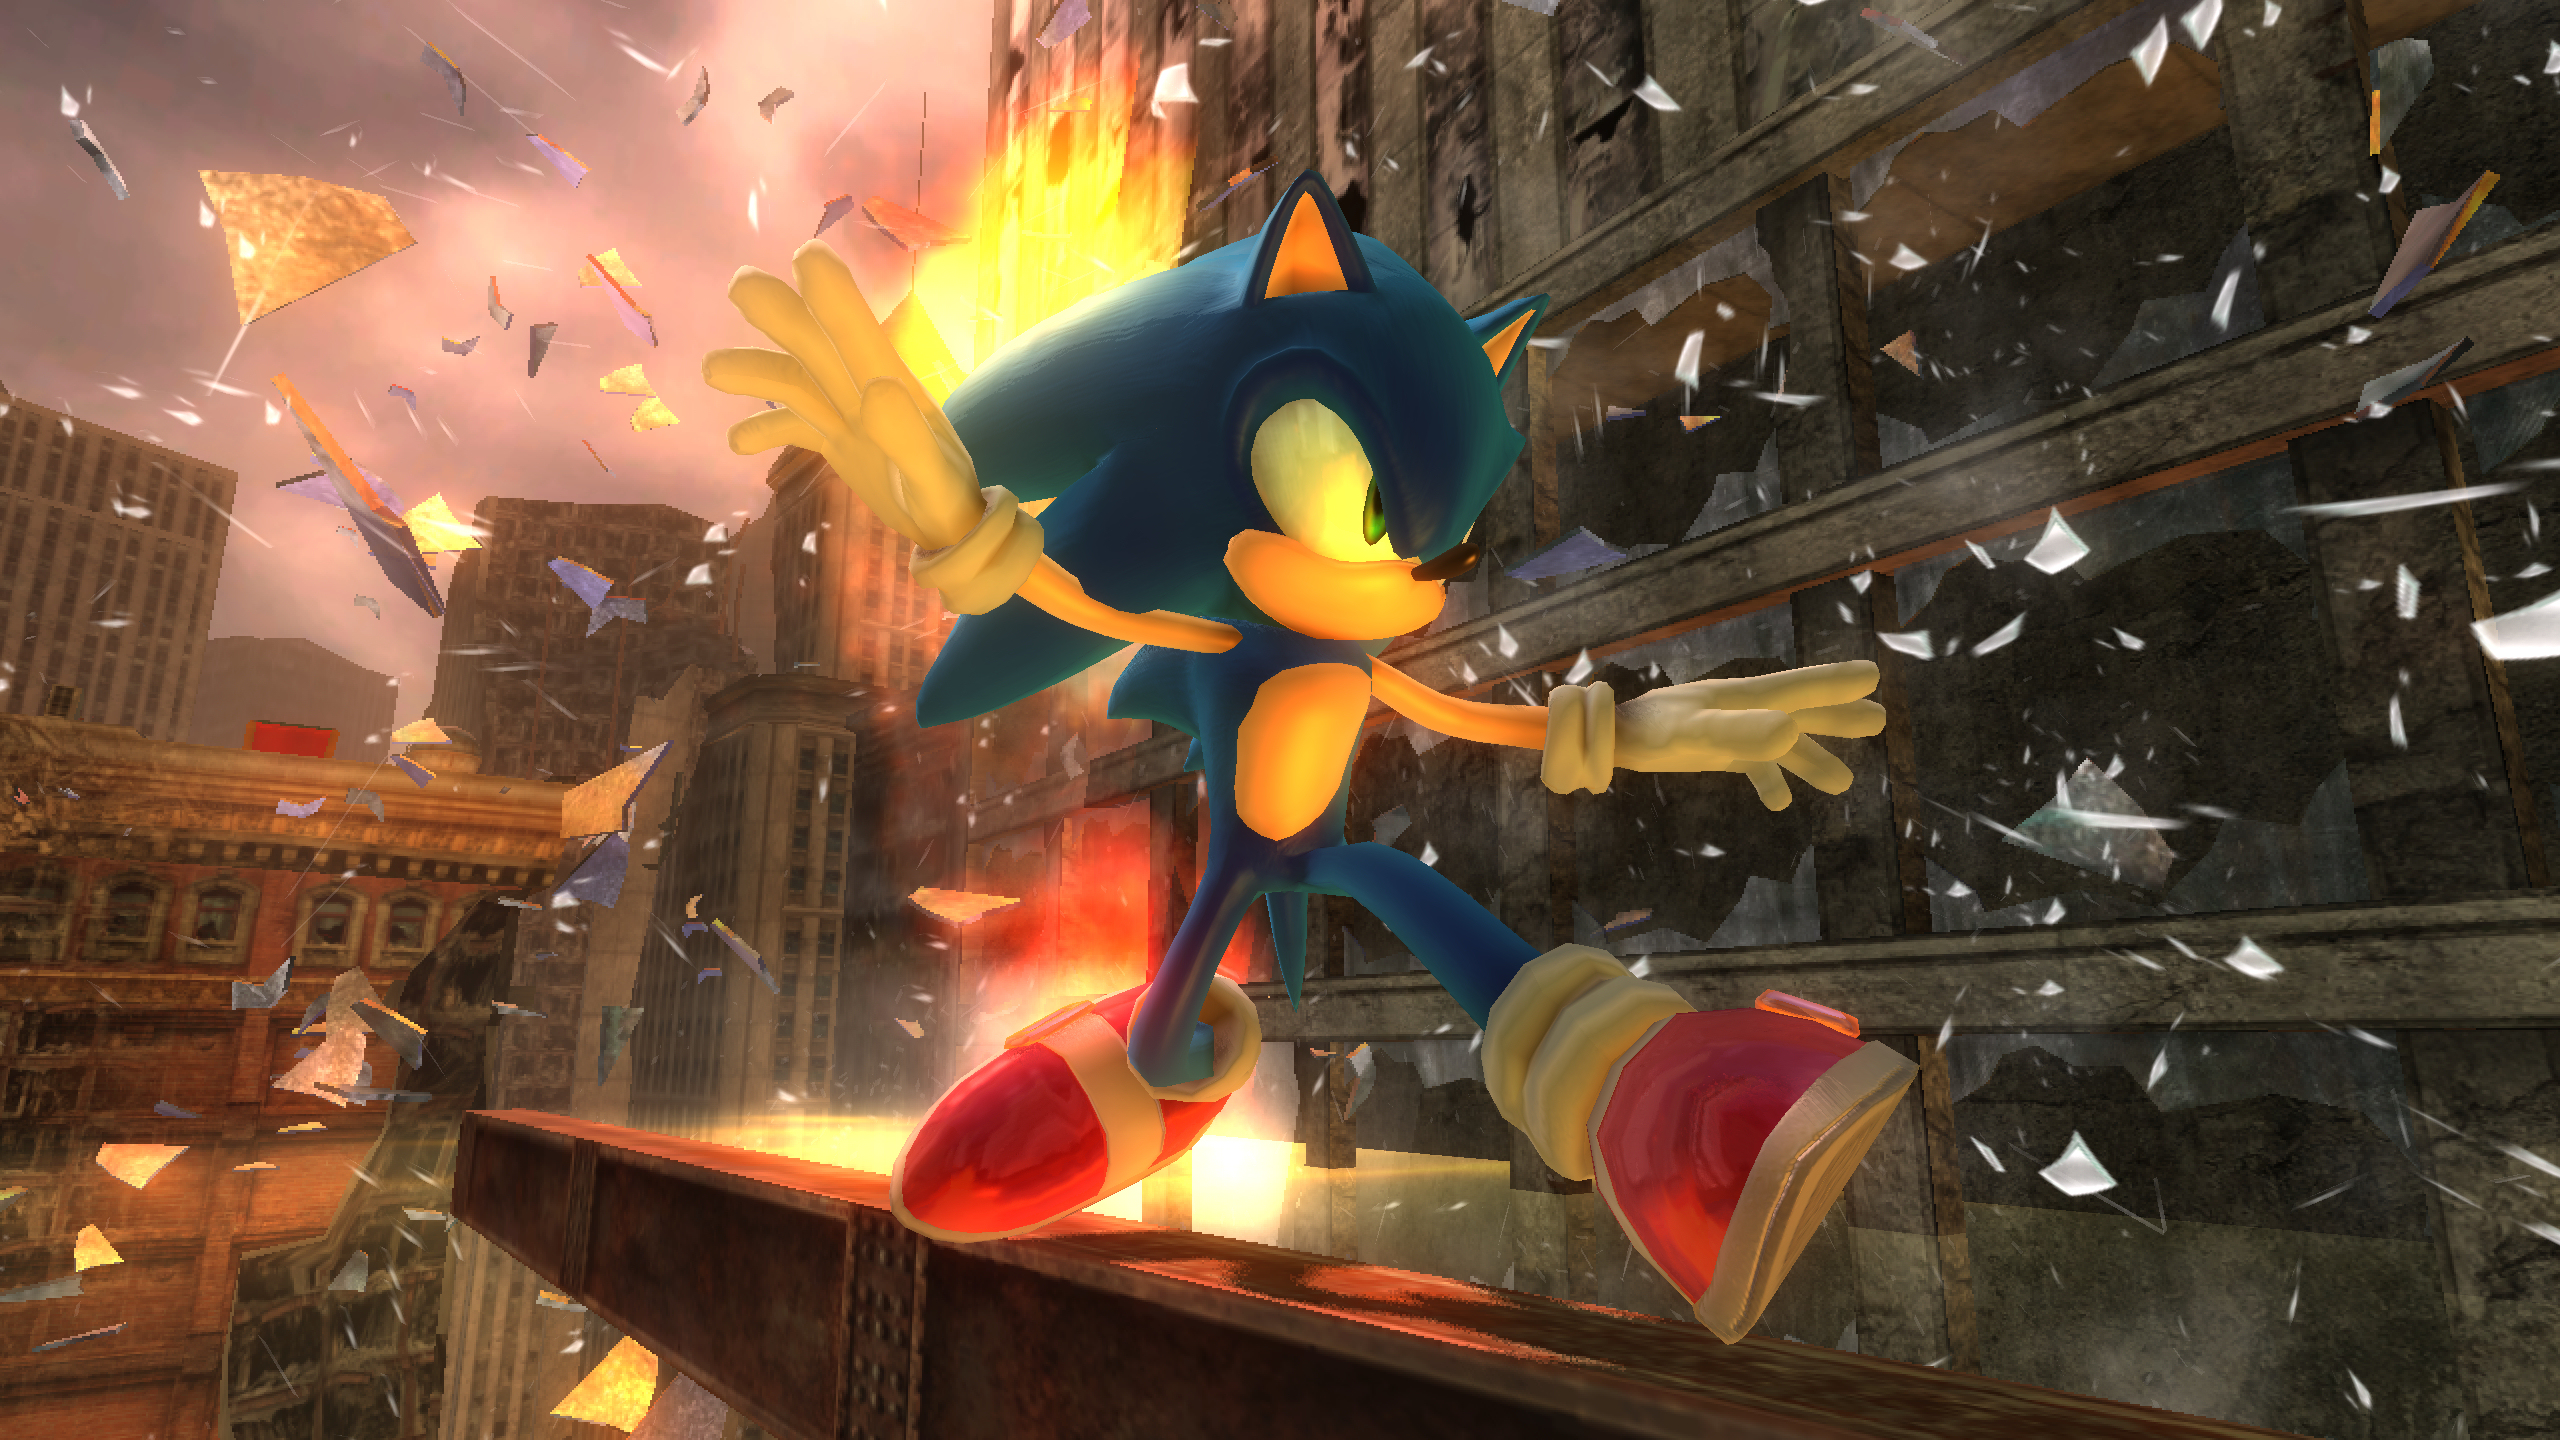 File:Sonic06screen47.jpg